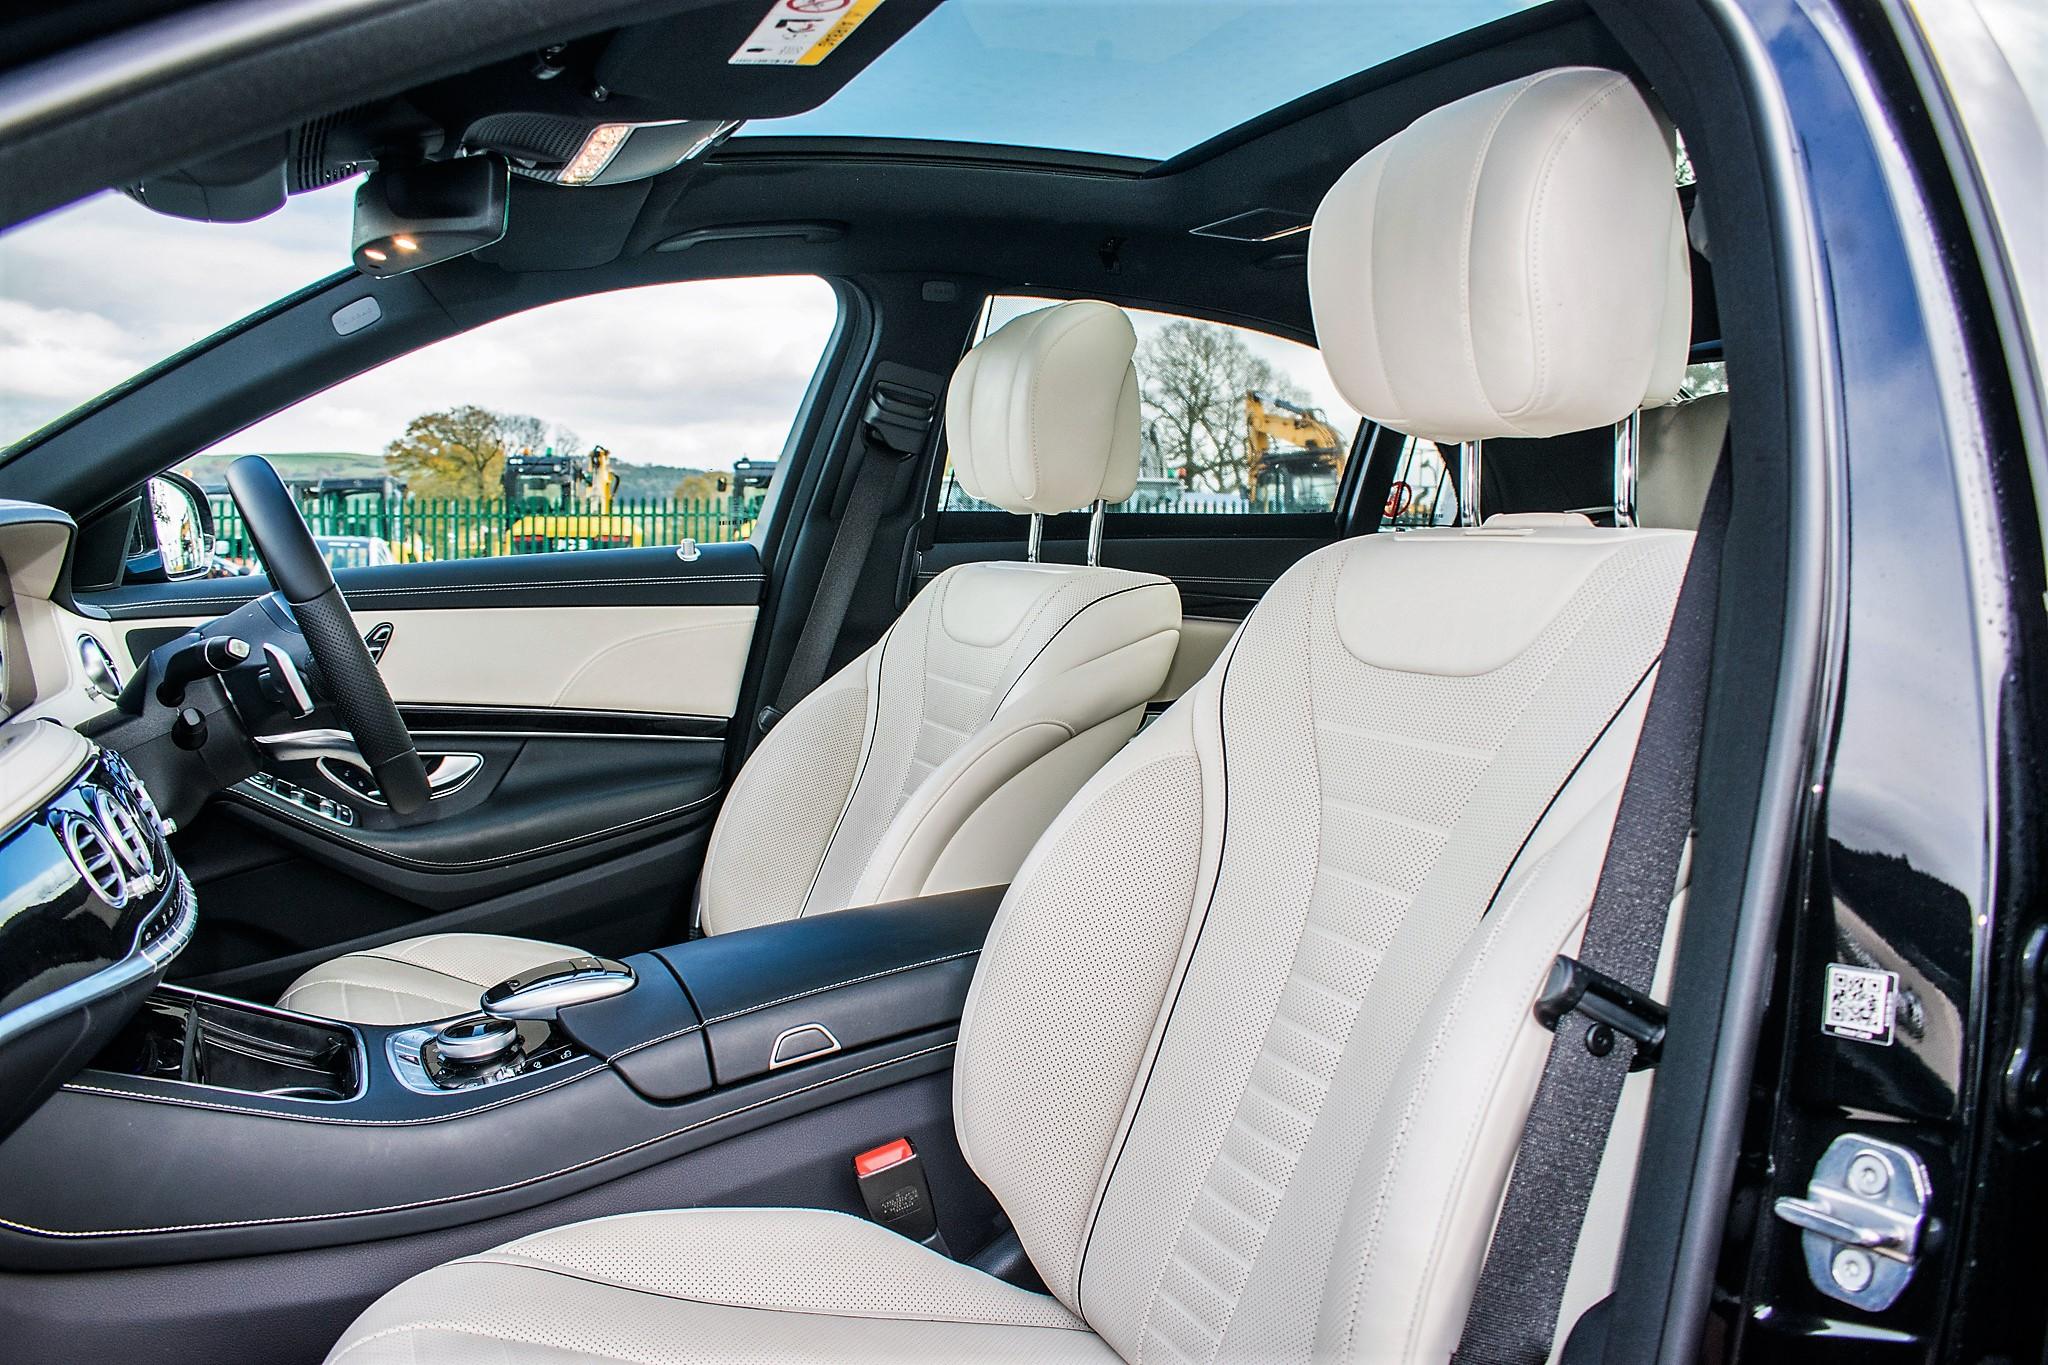 Mercedes Benz S450 L AMG Line Executive auto petrol 4 door saloon car Registration Number: FX68 - Image 22 of 30